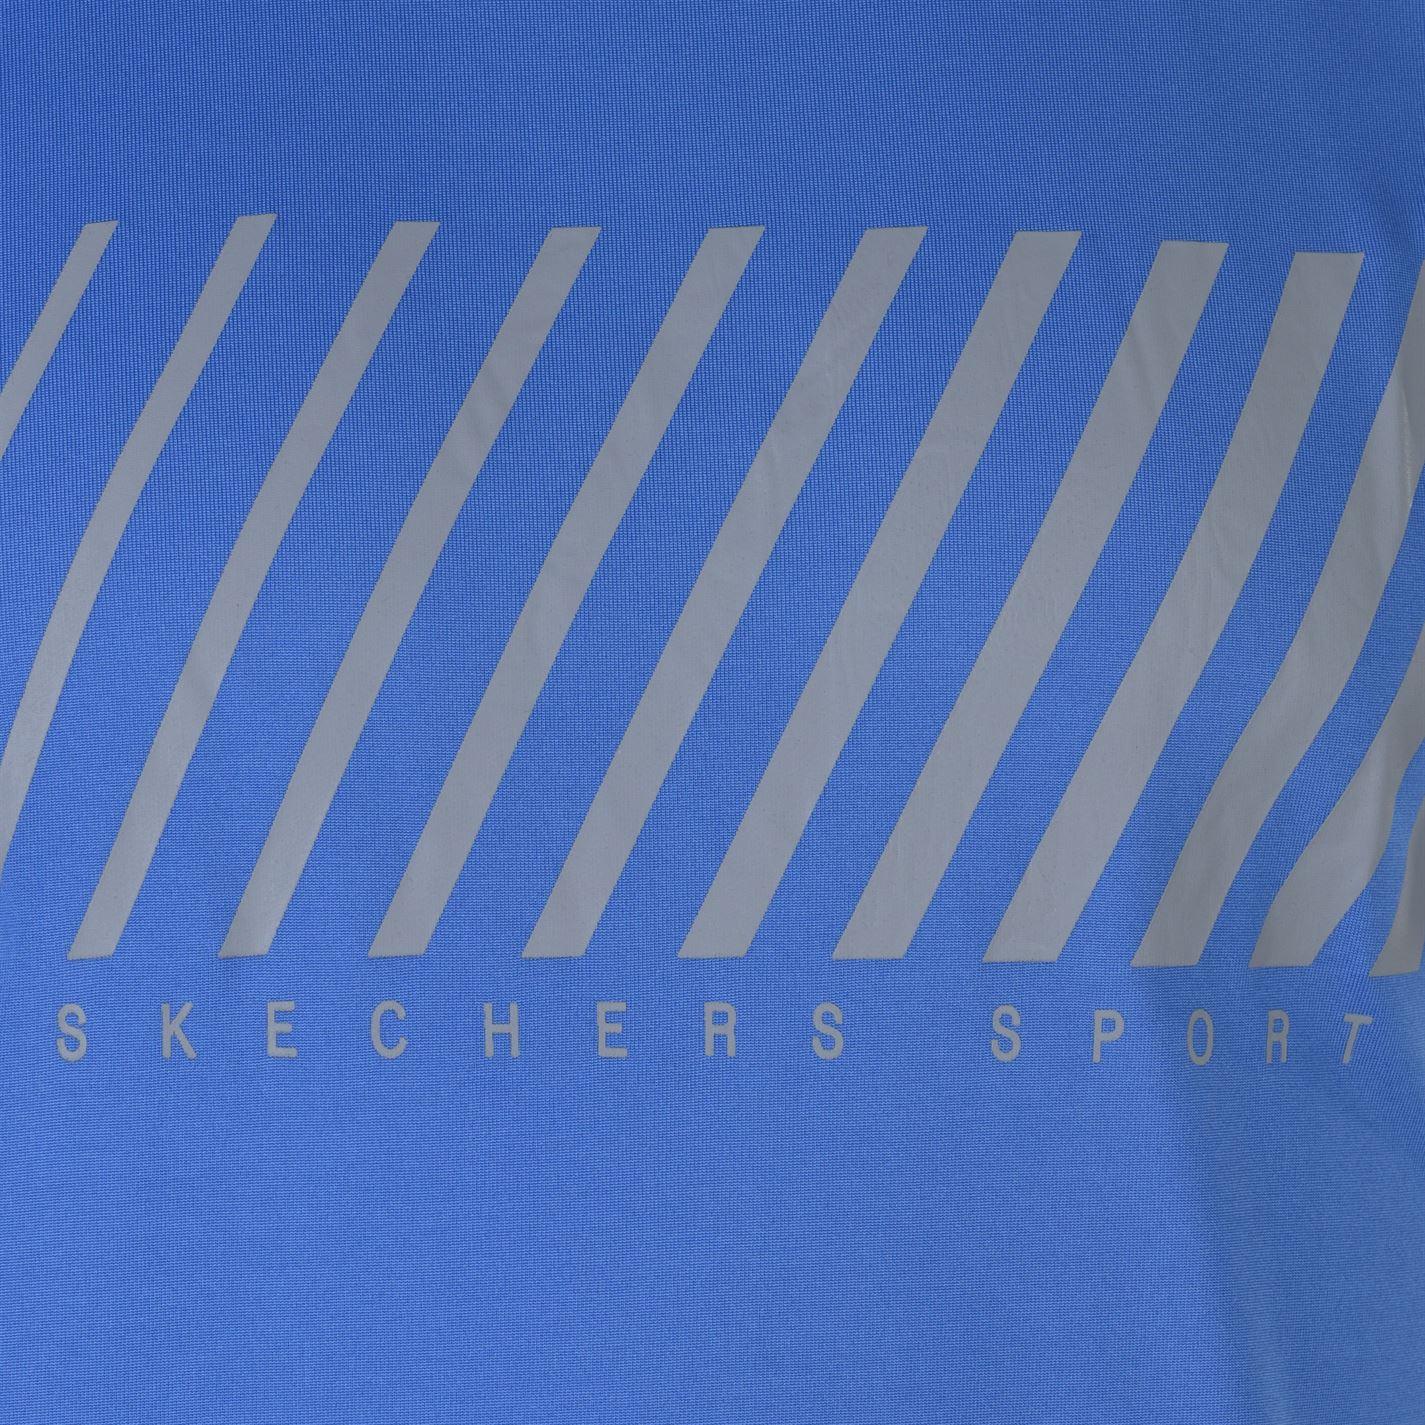 Skechers-Mens-Rendimiento-Grafico-camiseta-Manga-Corta-Camiseta-Top-Cuello-Redondo miniatura 13